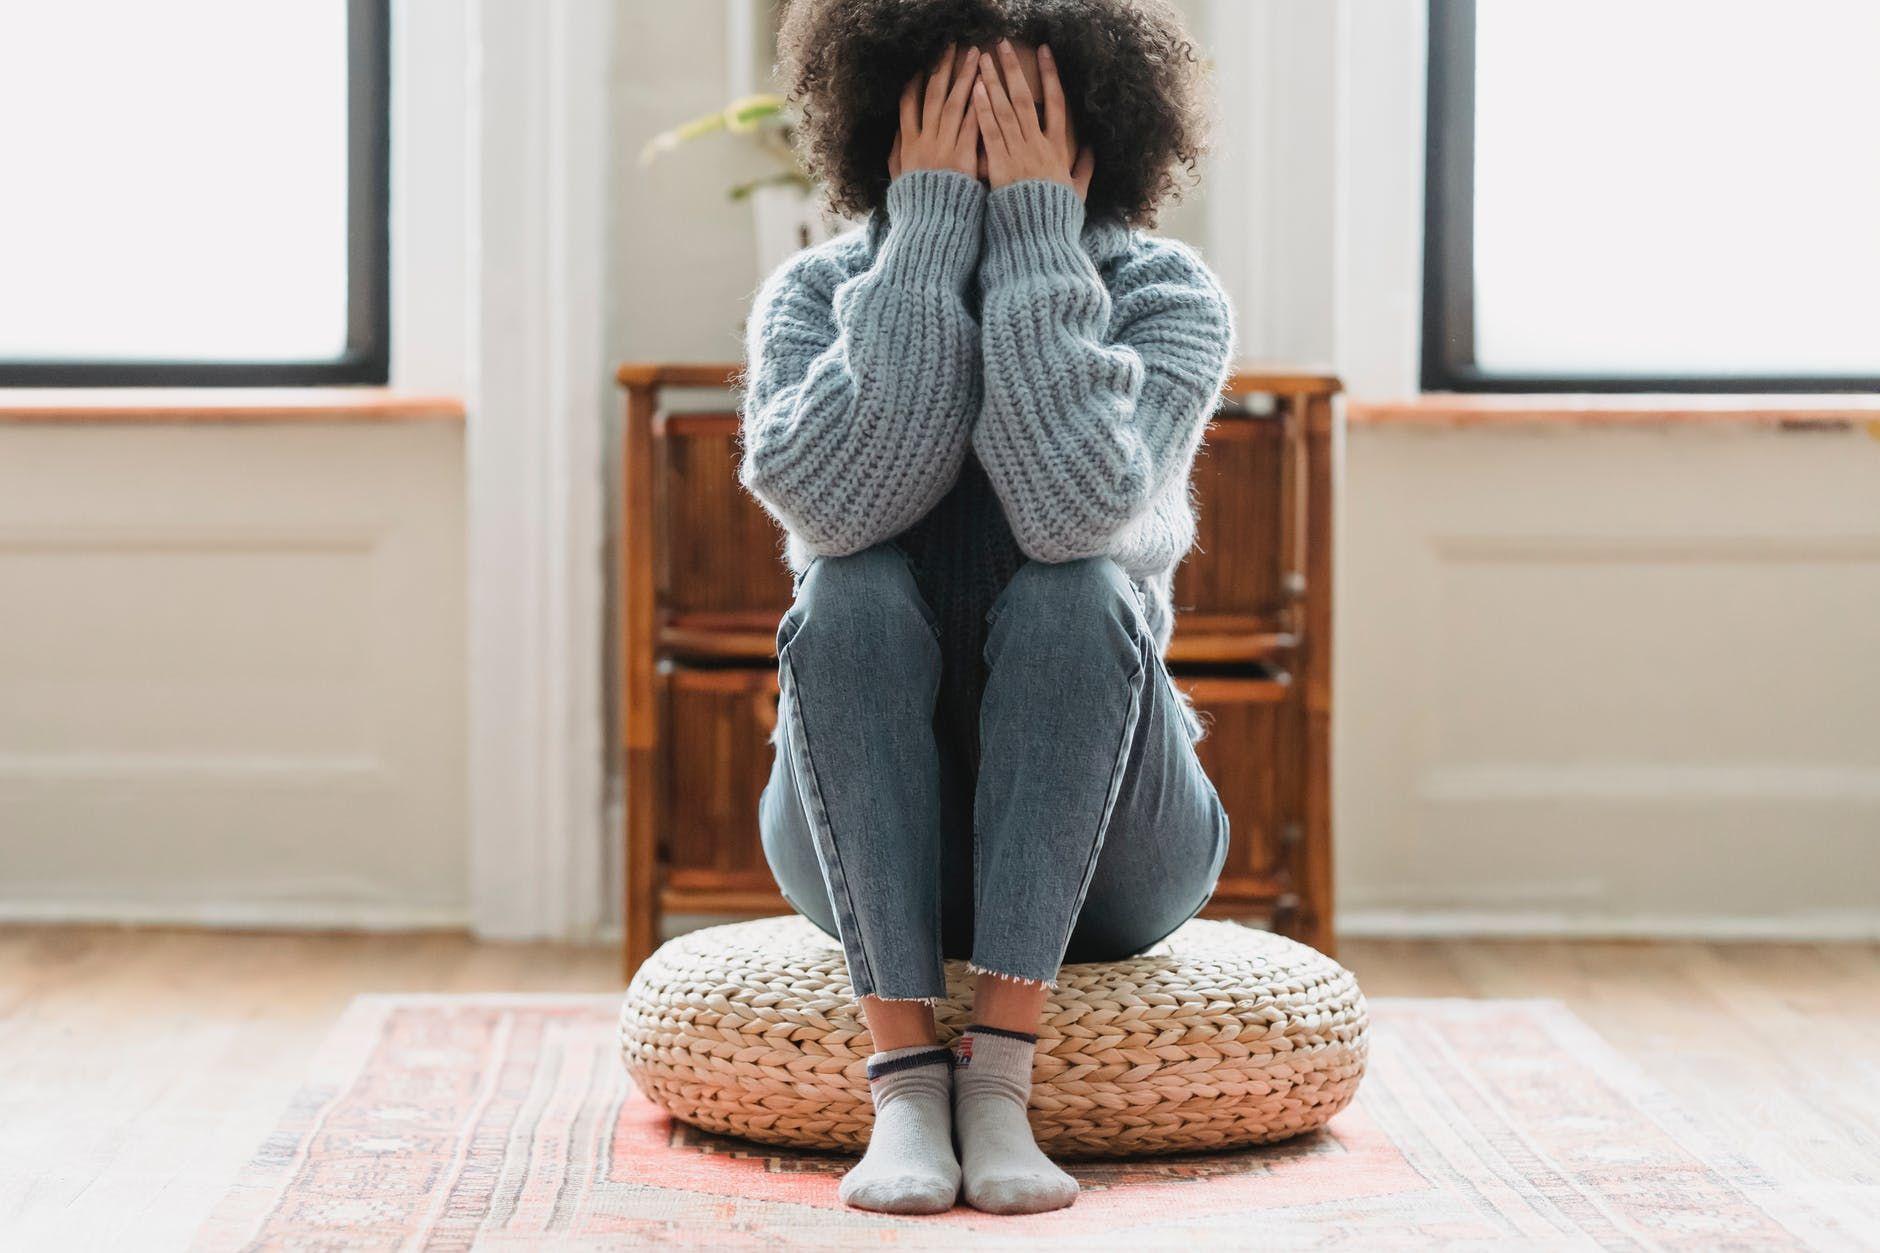 10 Kesalahan yang Biasa Dilakukan Zodiak Libra dalam Hubungan